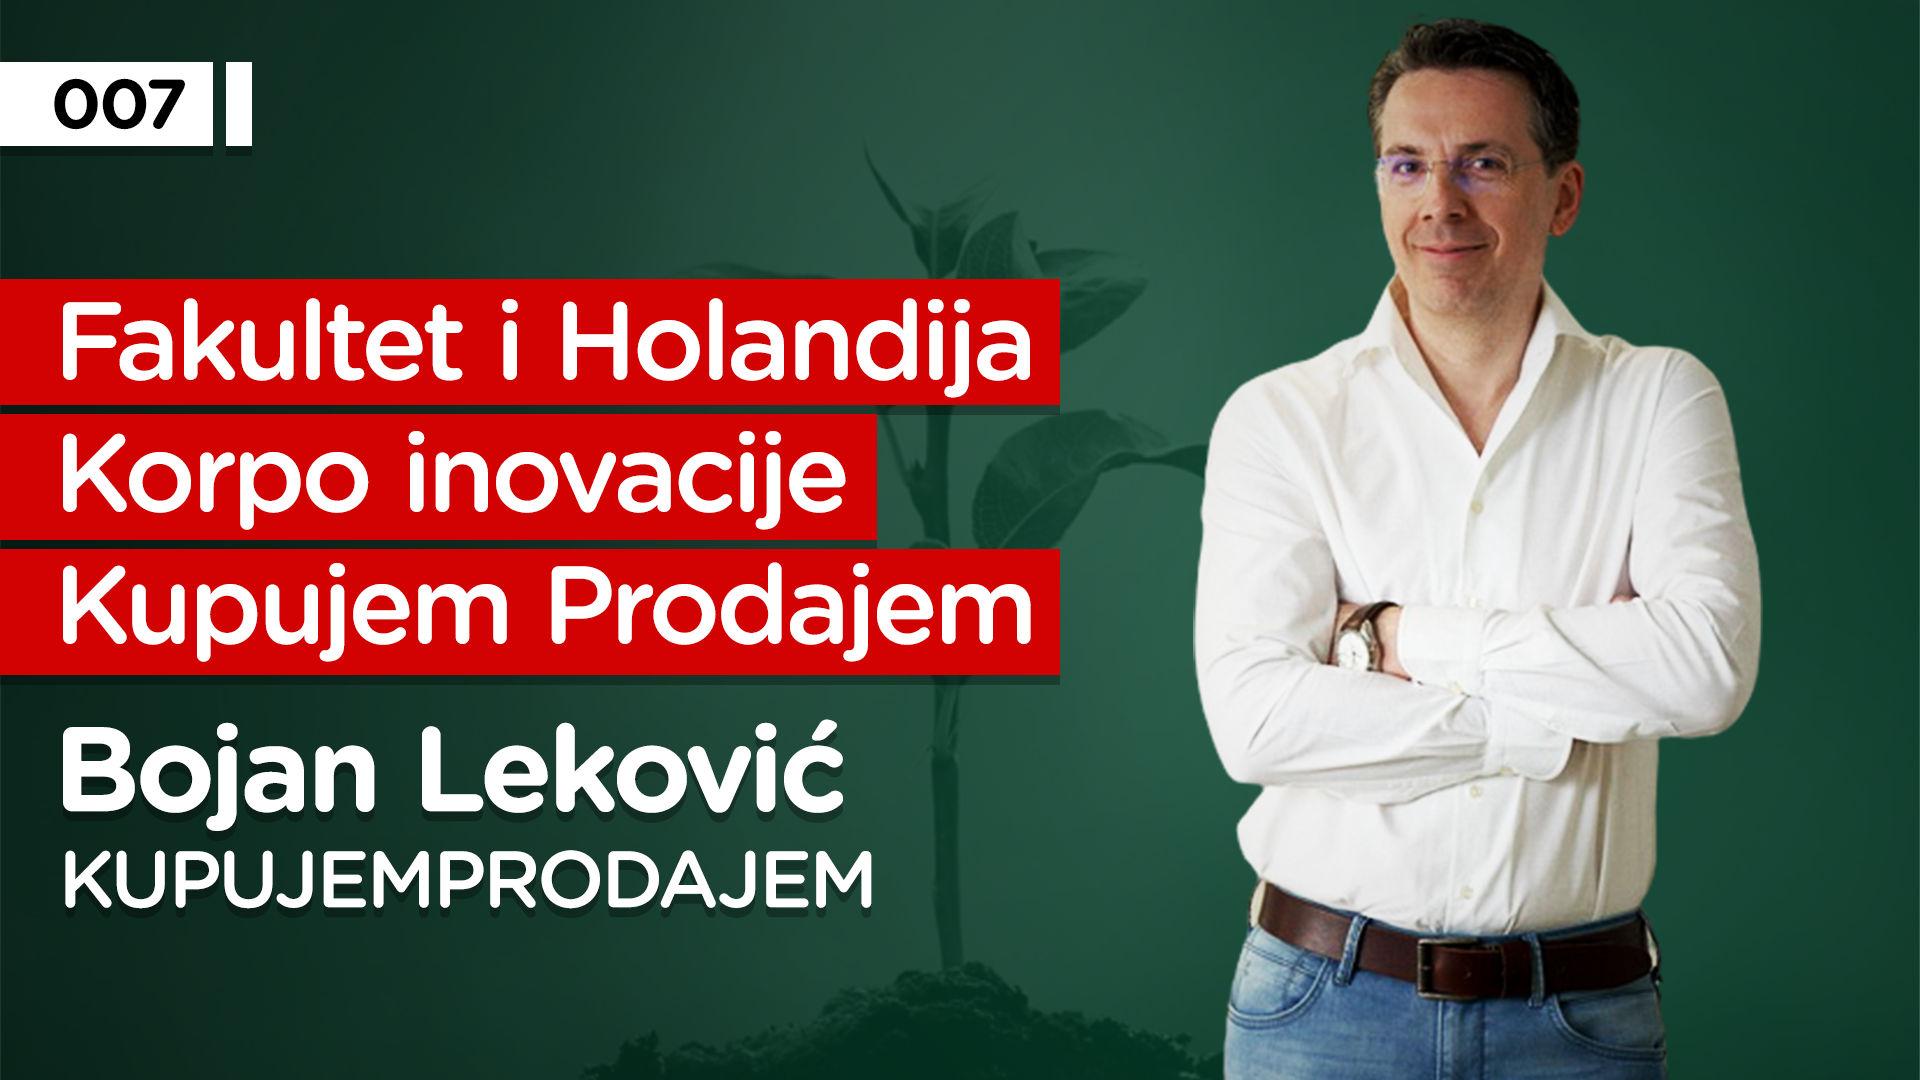 EP007: Bojan Leković